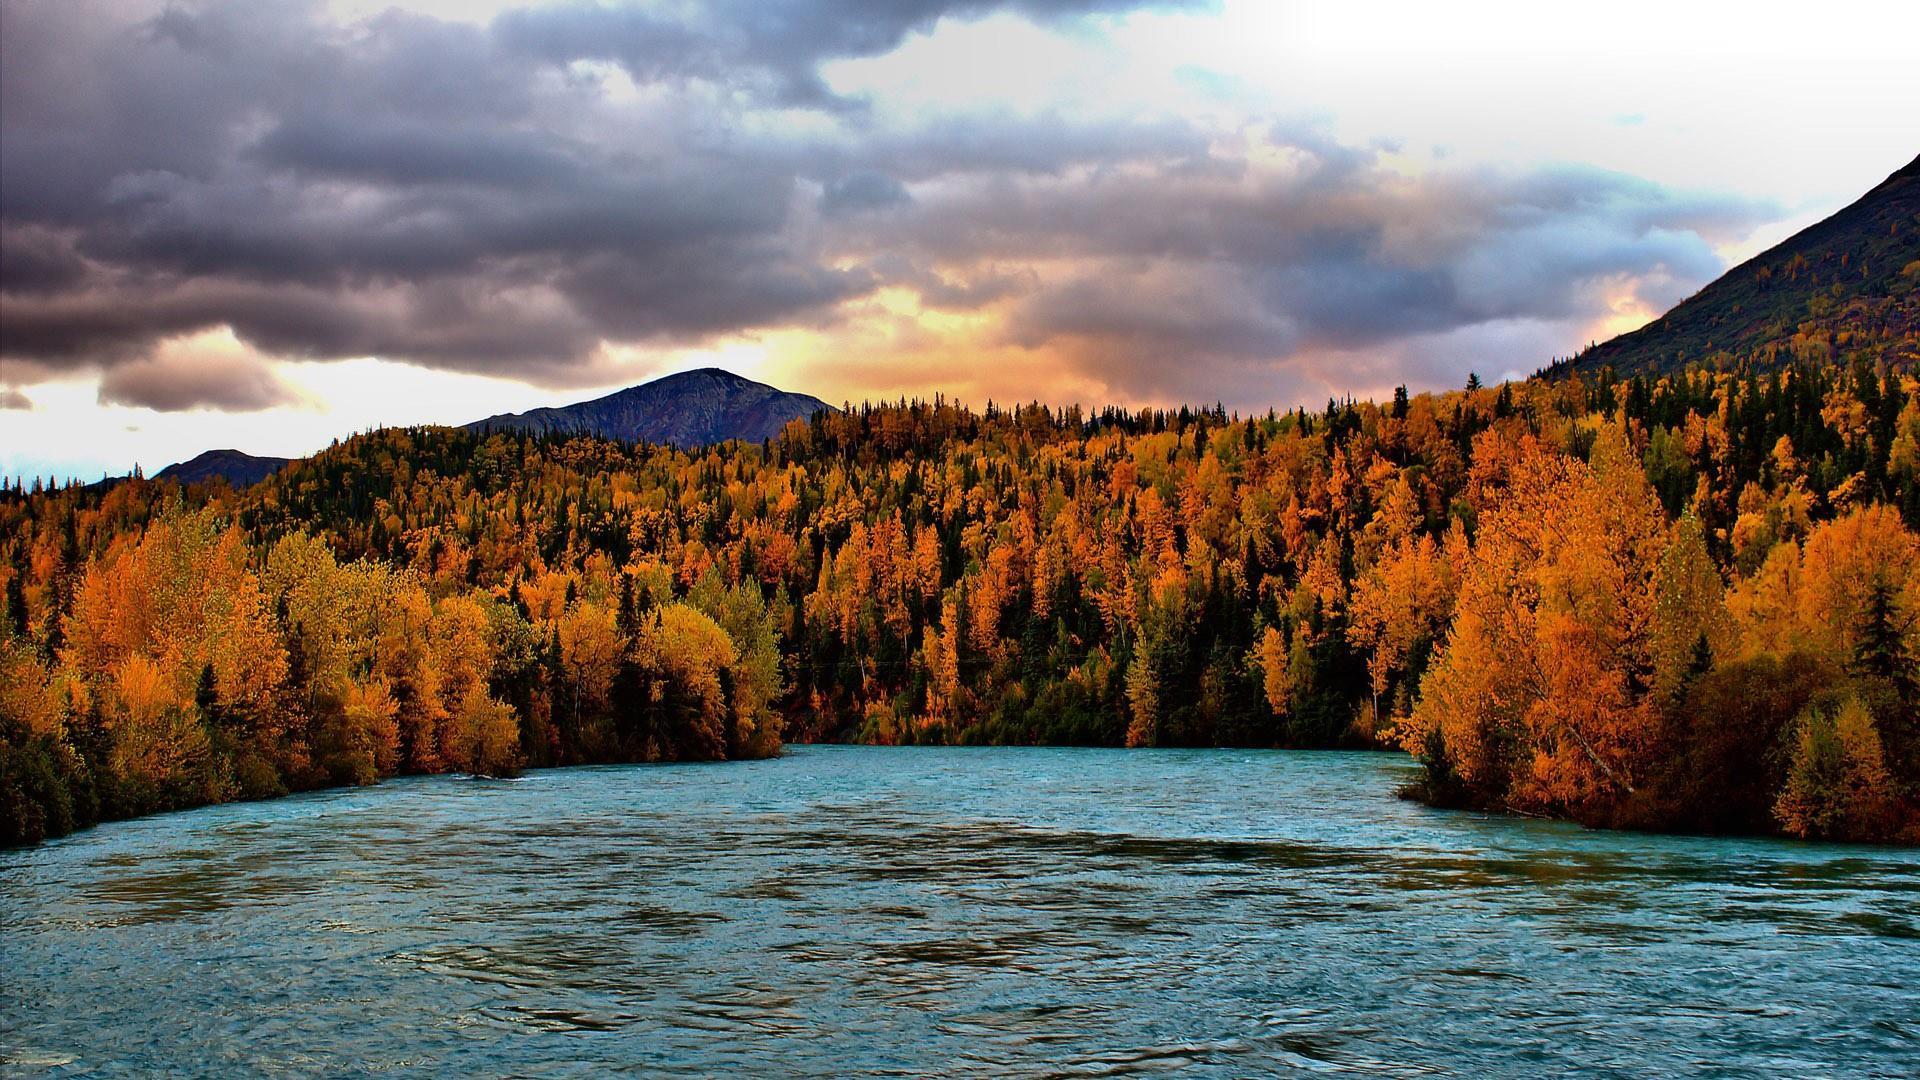 Autumn in Alaska  wallpaper